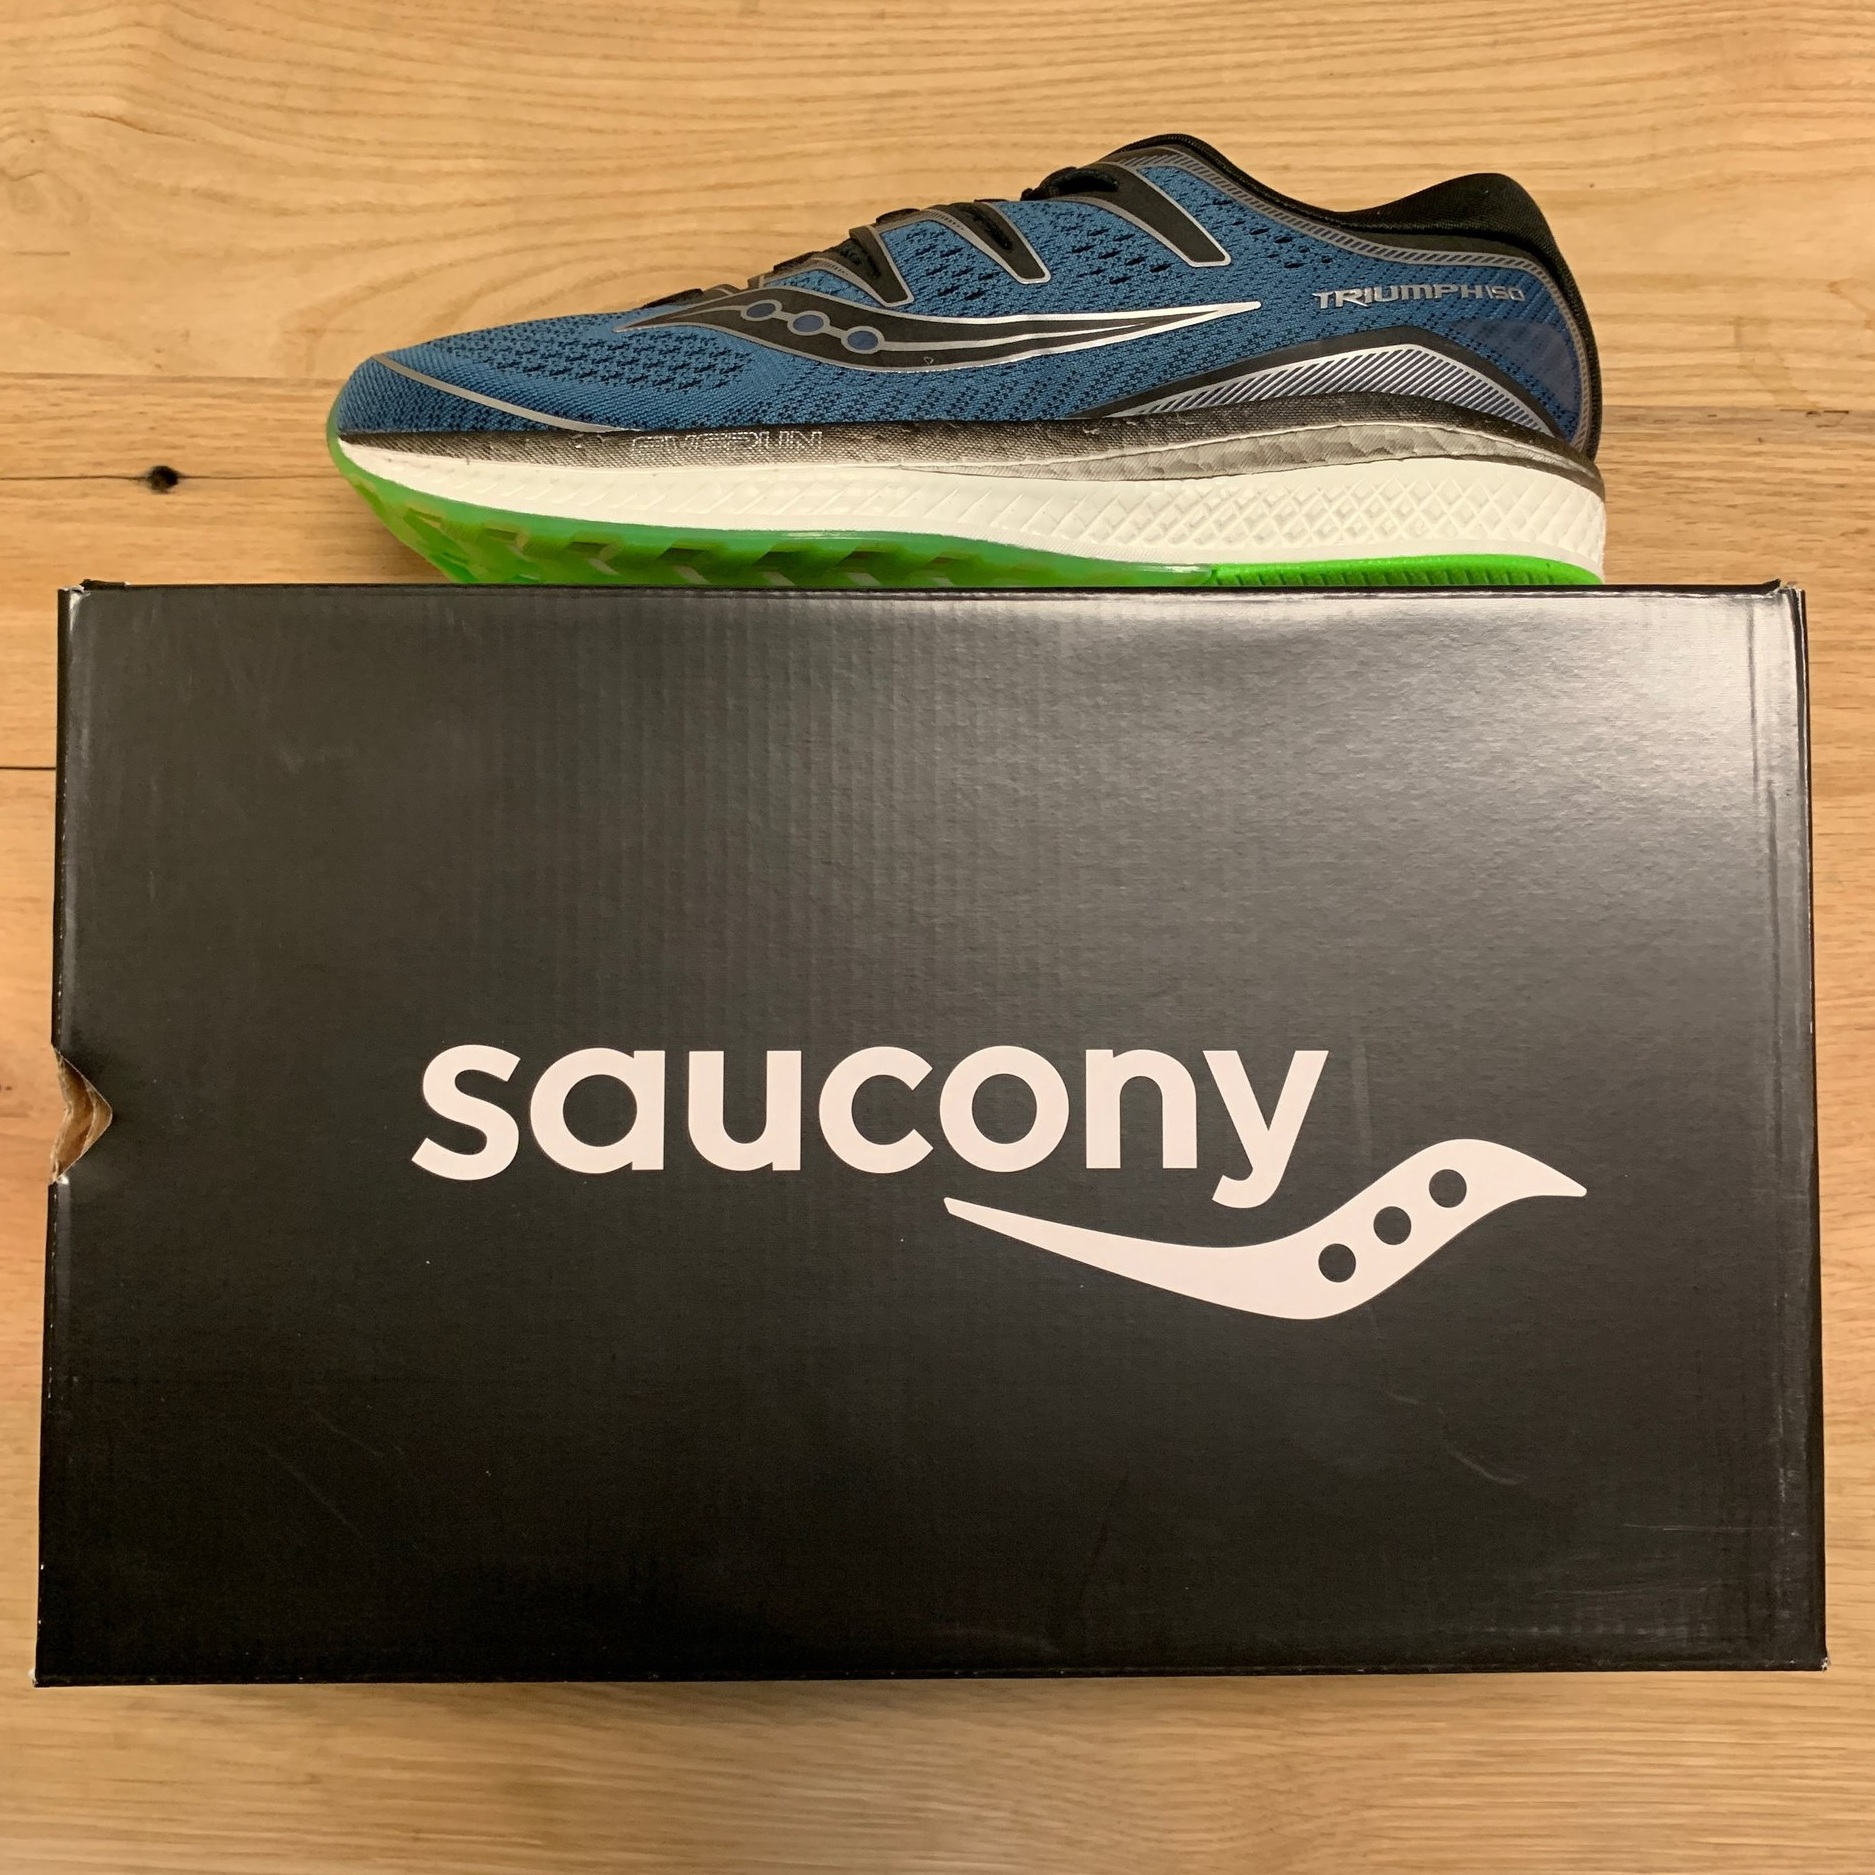 Saucony Triumph ISO 5 - Men's